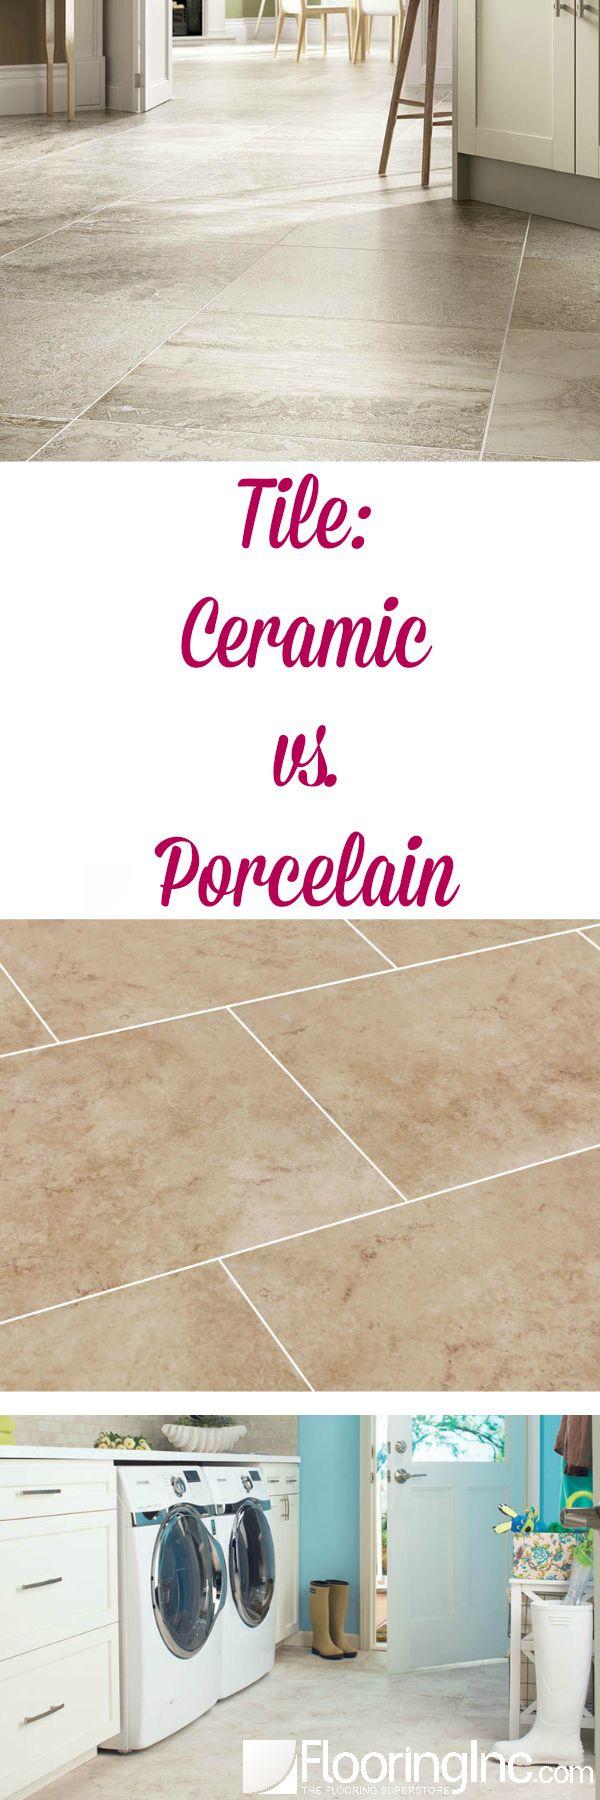 Tile: Ceramic vs. Porcelain